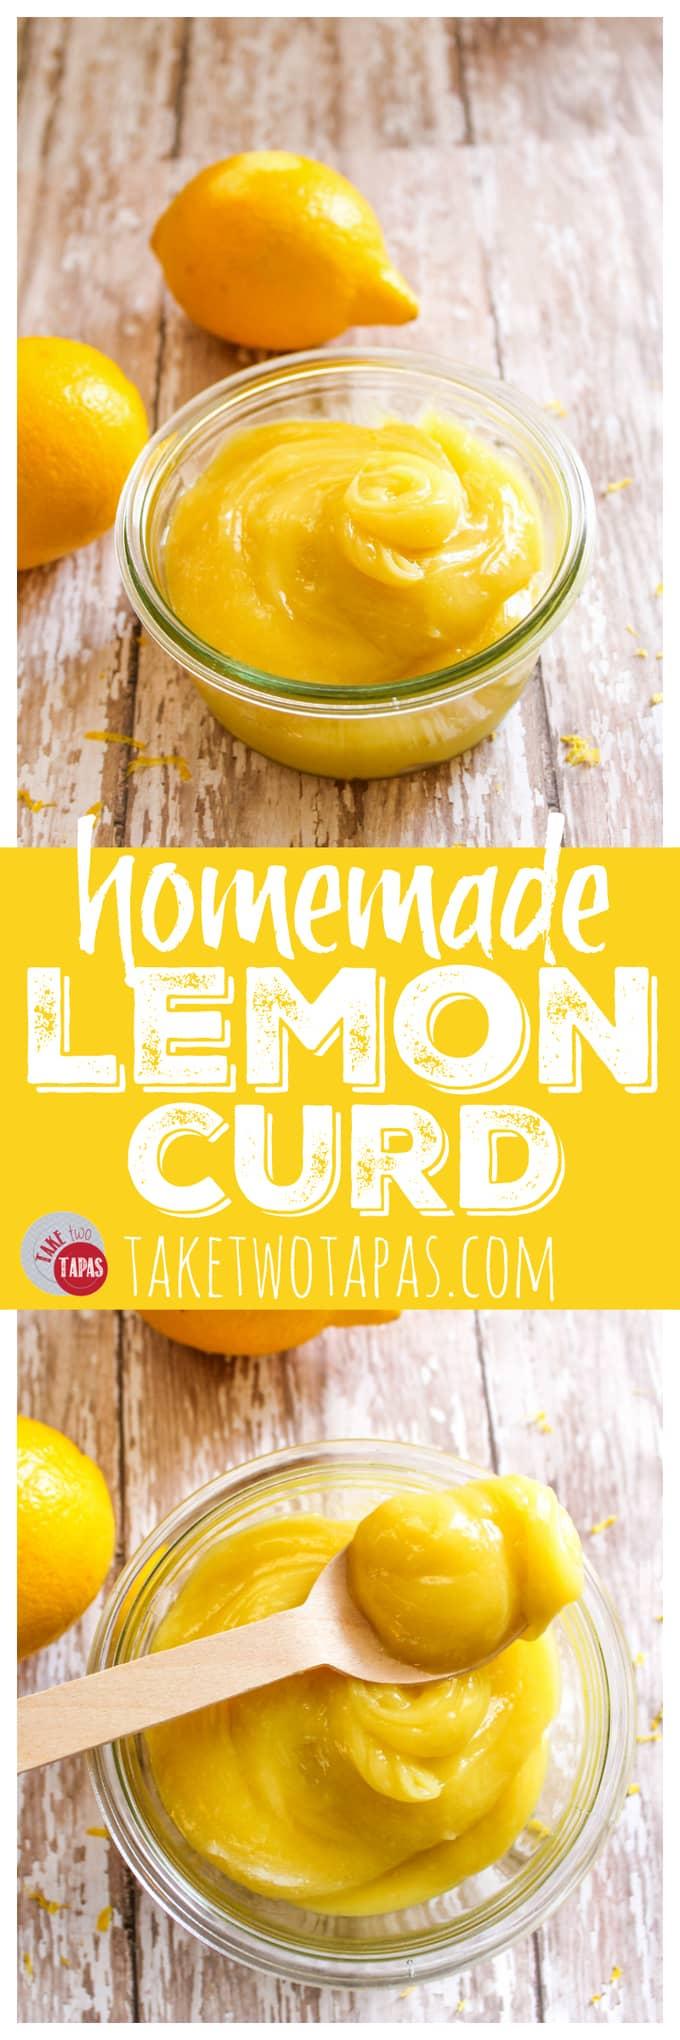 Lemon Curd in 10 Minutes Homemade | Take Two Tapas | #lemon #LemonCurd #Desserts #Homemade